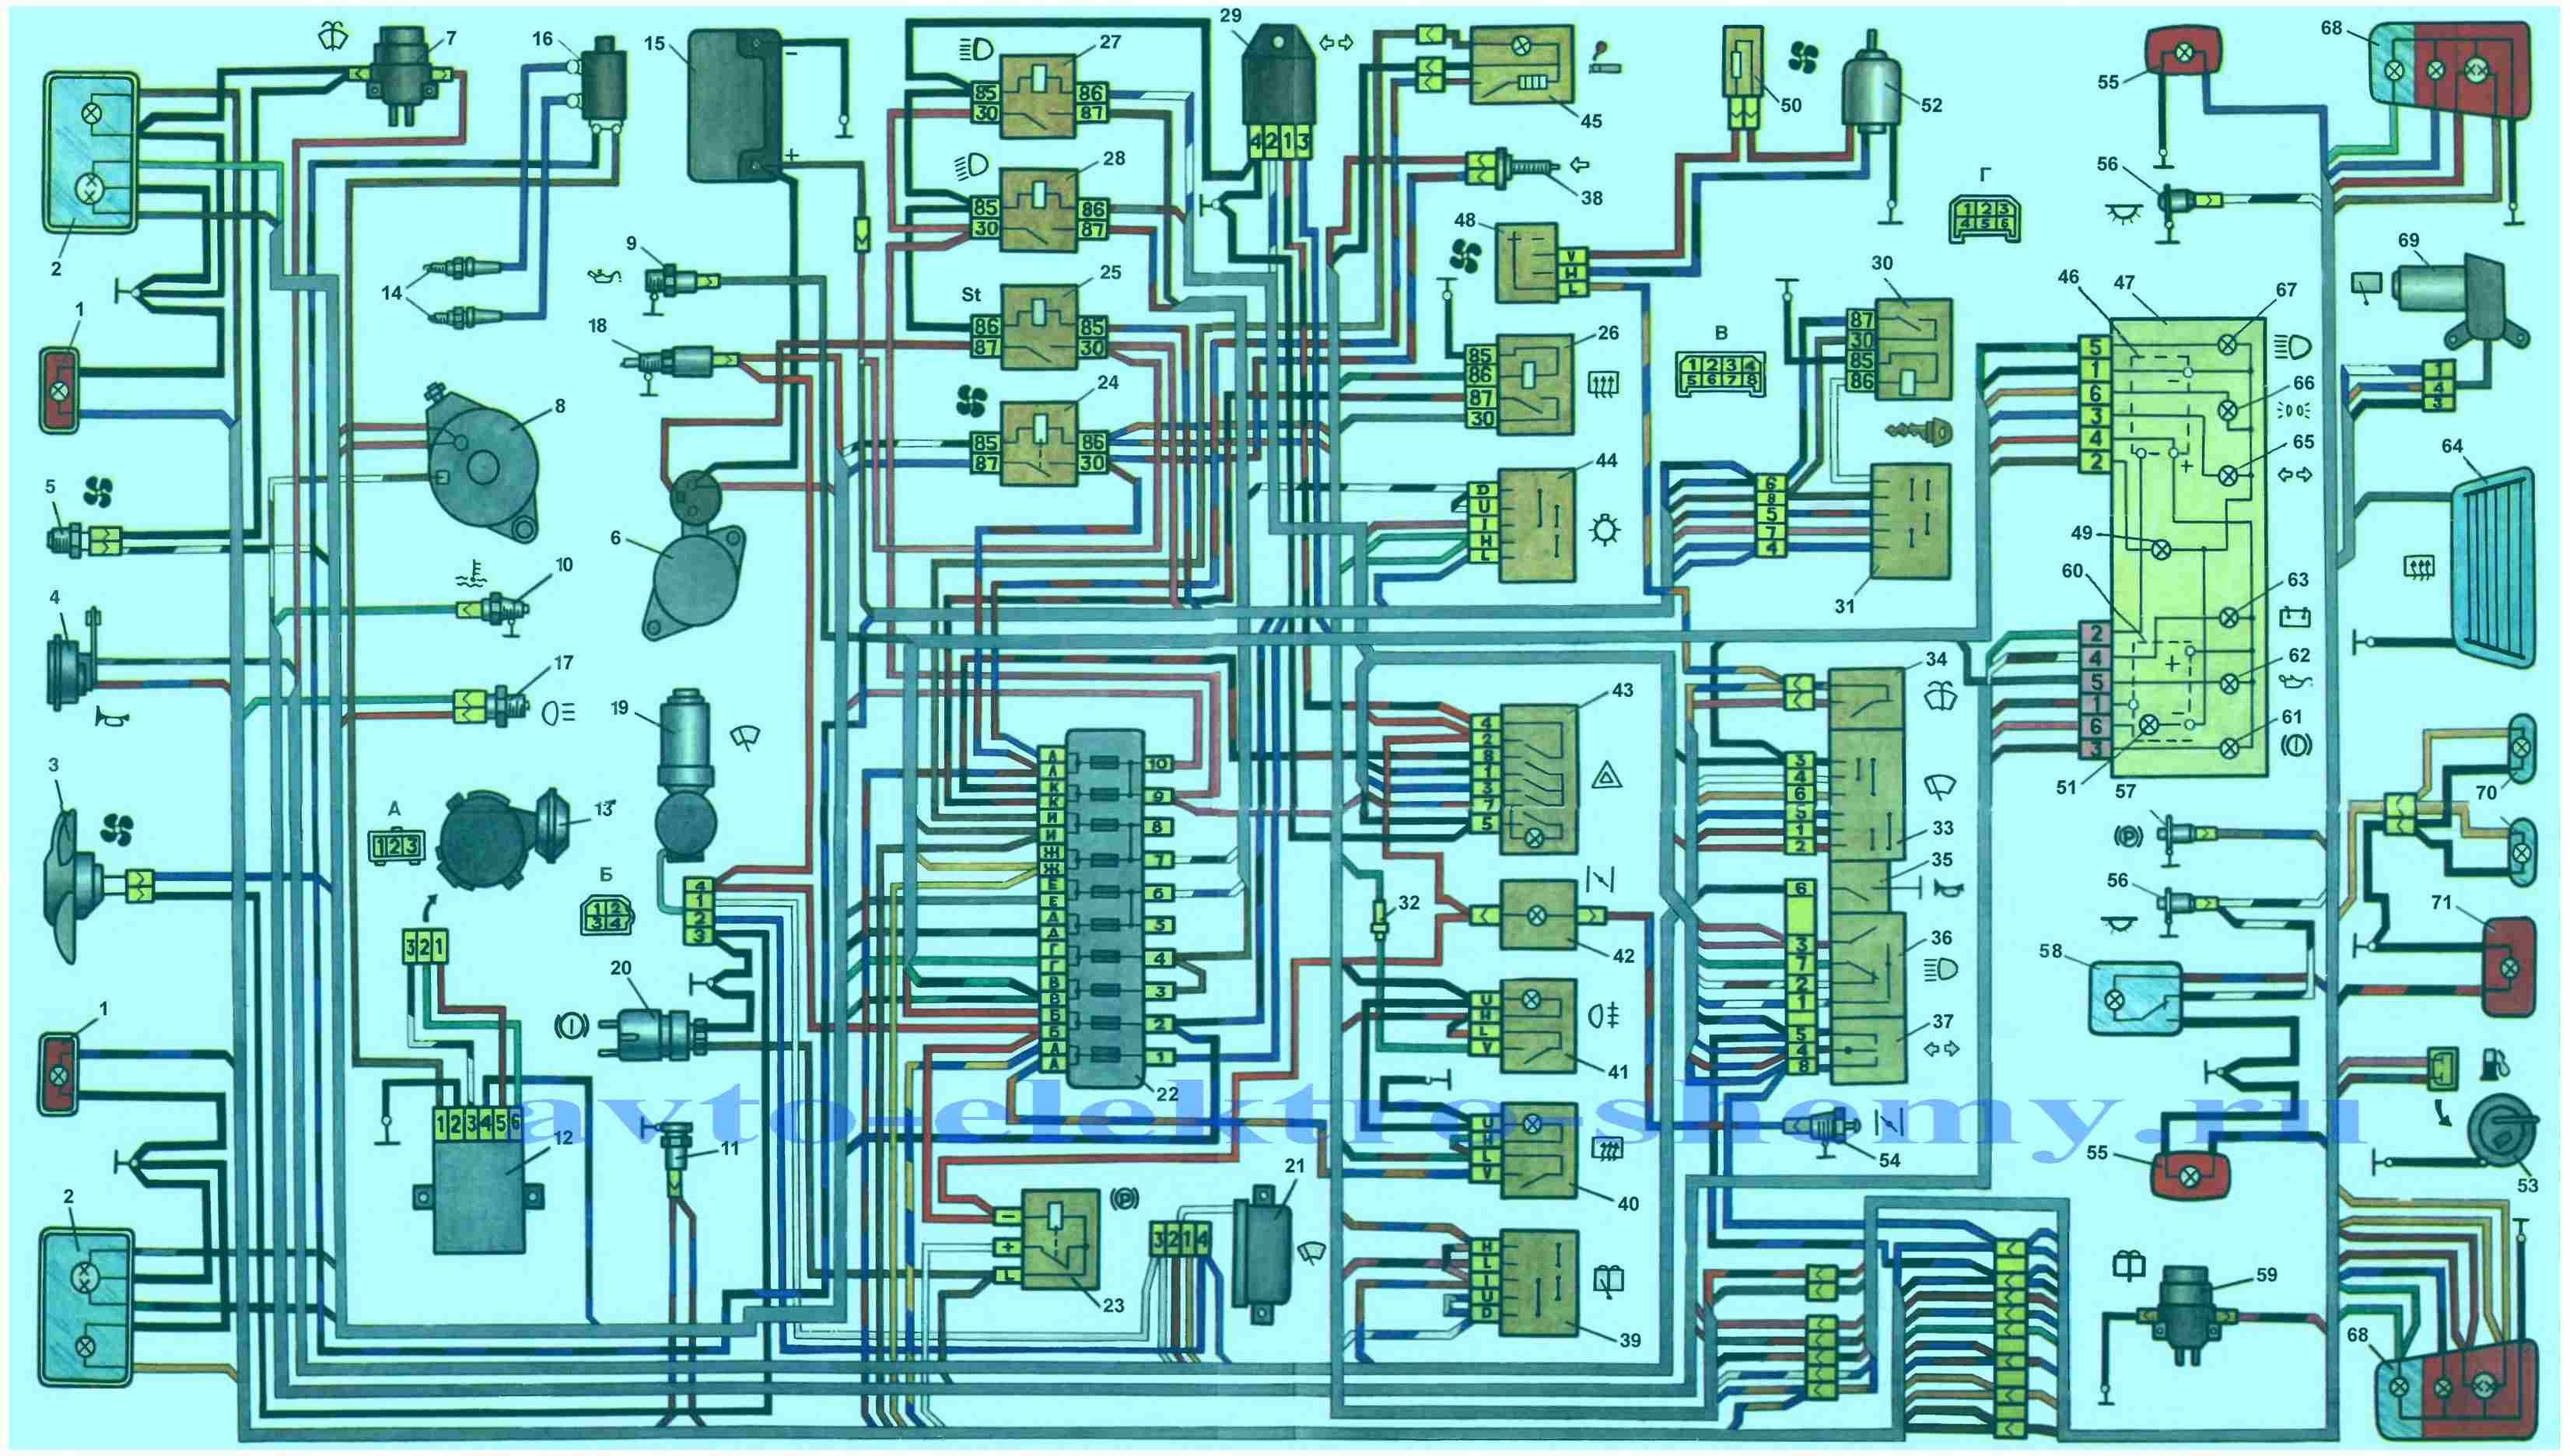 Lt b gt электрическая схема lt b gt проводки автомобиля ока lt b gt ваз lt b gt lt b gt 1111 lt b gt lt b gt.